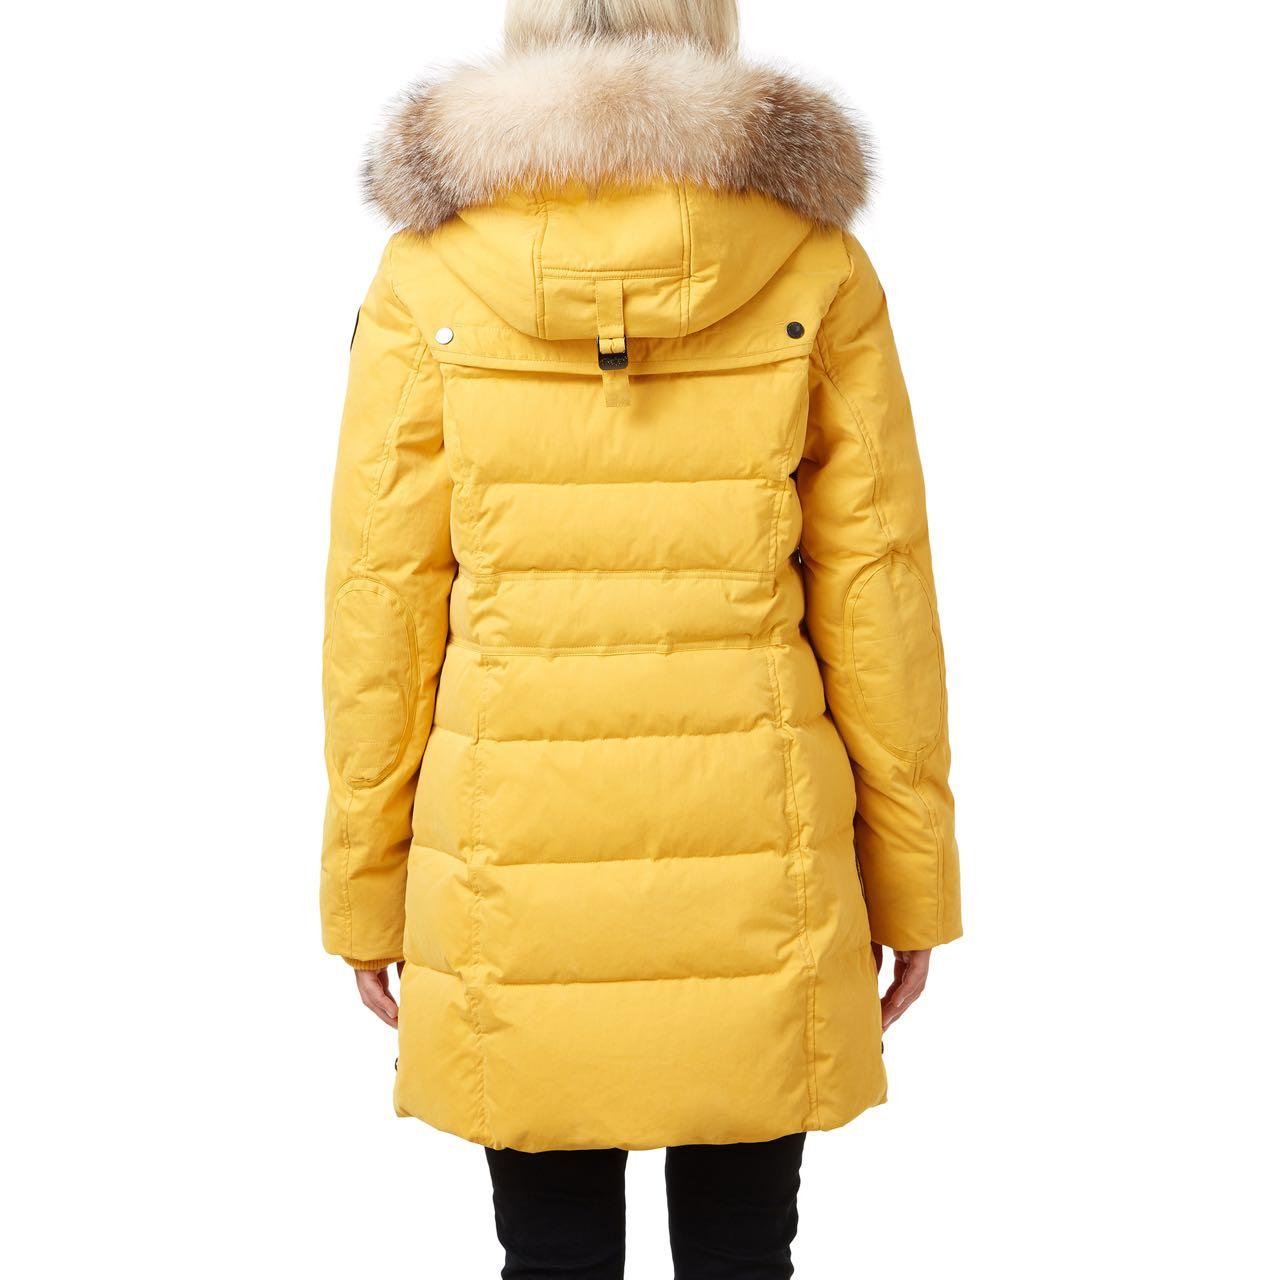 Pajar Winter Down Coat Parka AVA Mustard Yellow Fur Hood ...